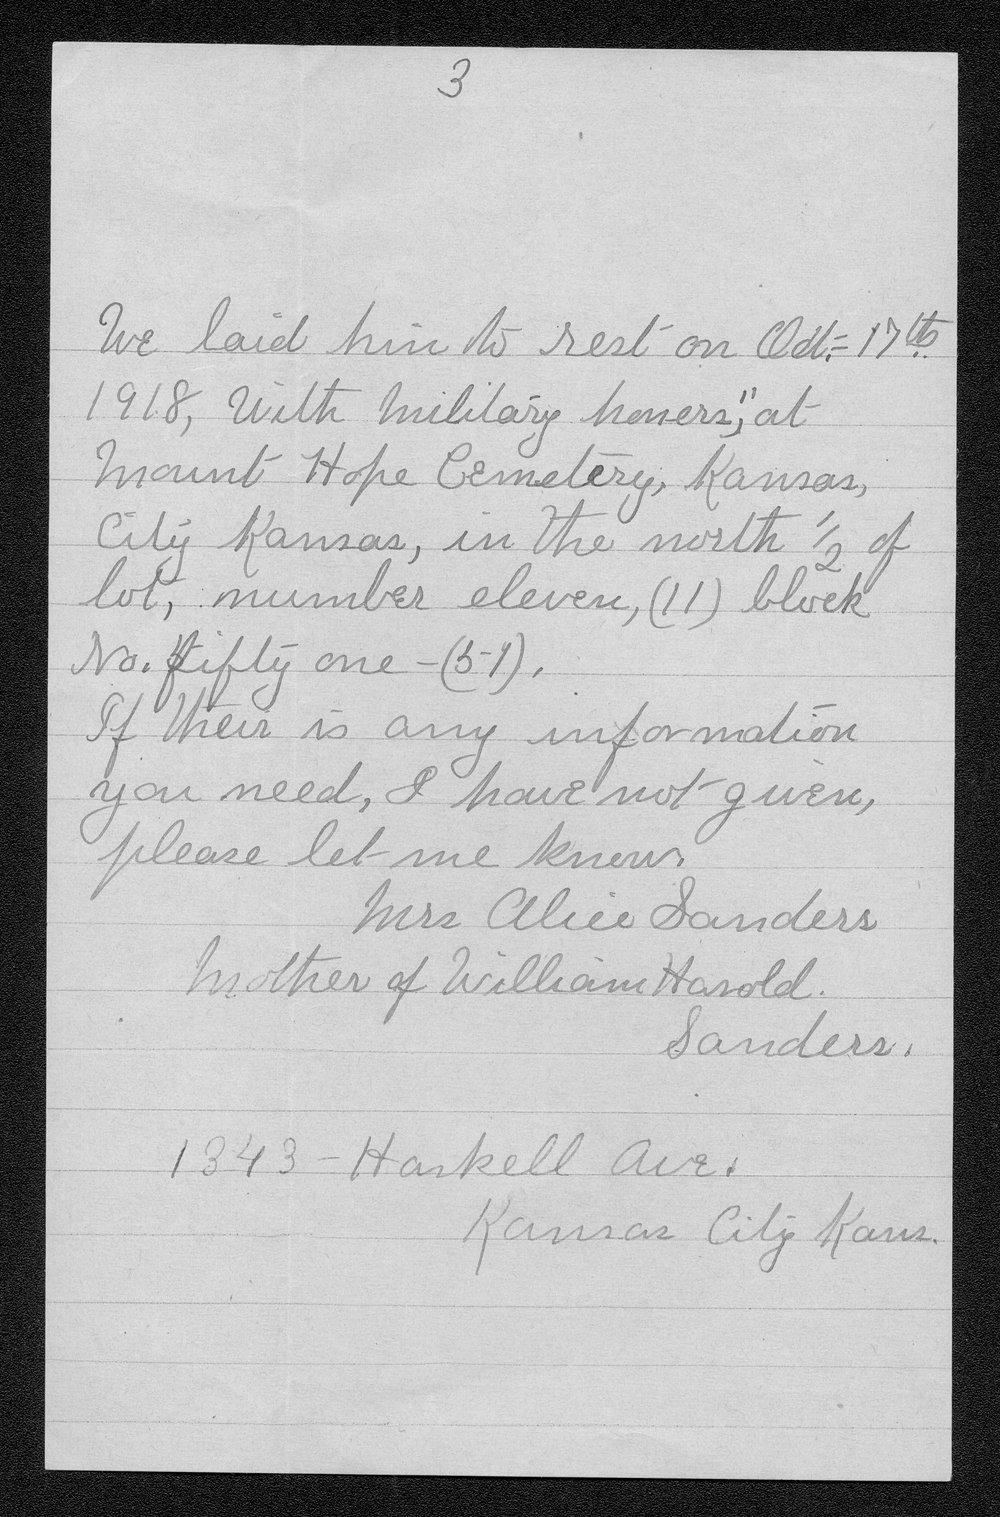 William Harold Sanders, World War I soldier - 5